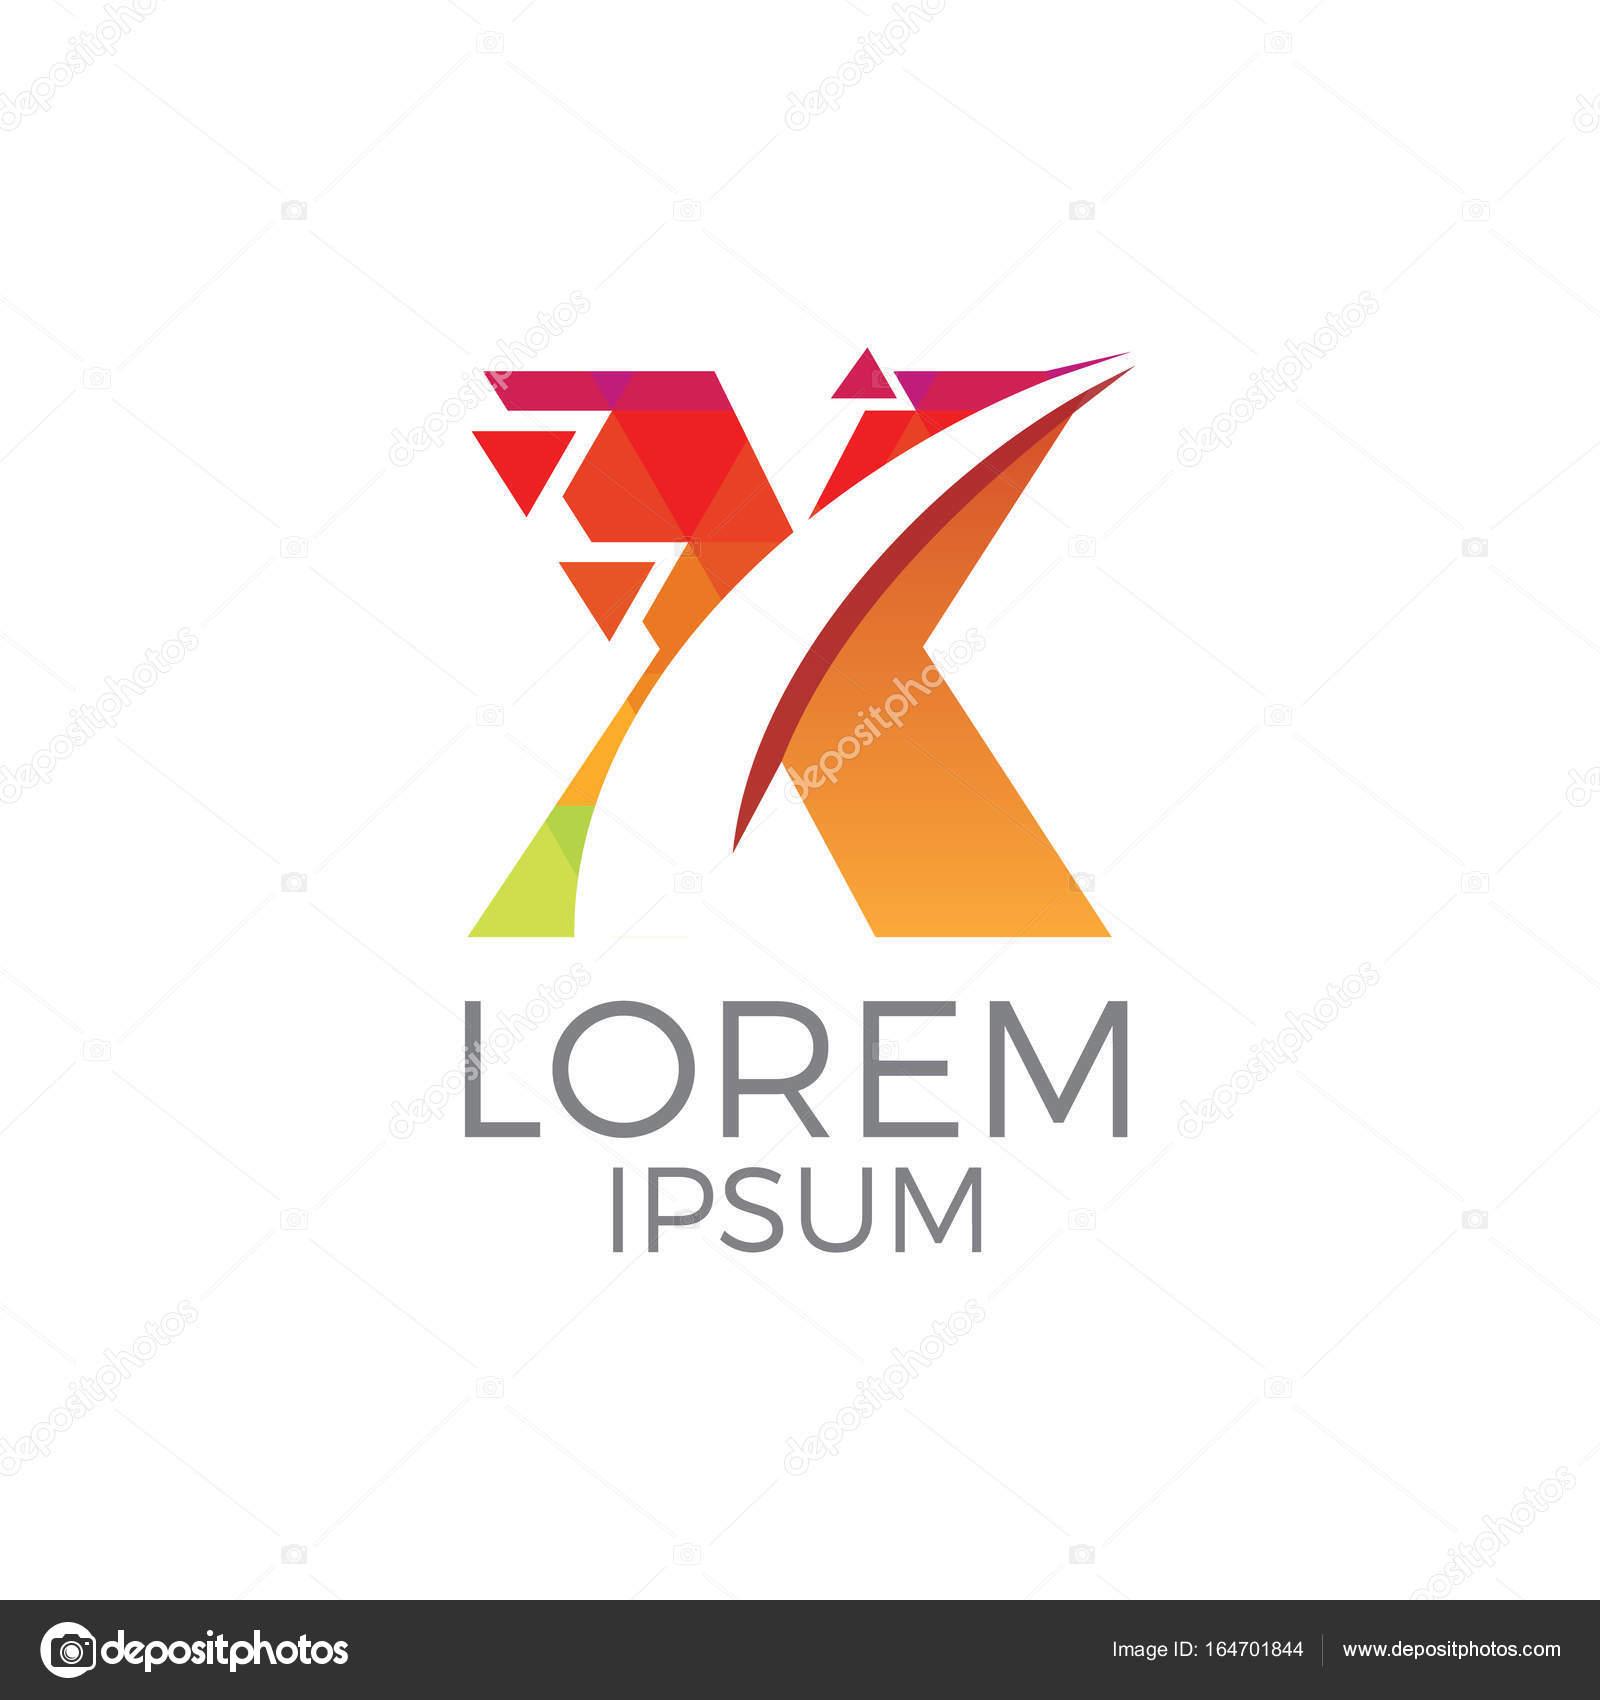 Modern And Colorful Letter X Geometric Stock Vector C Andiasmara 164701844